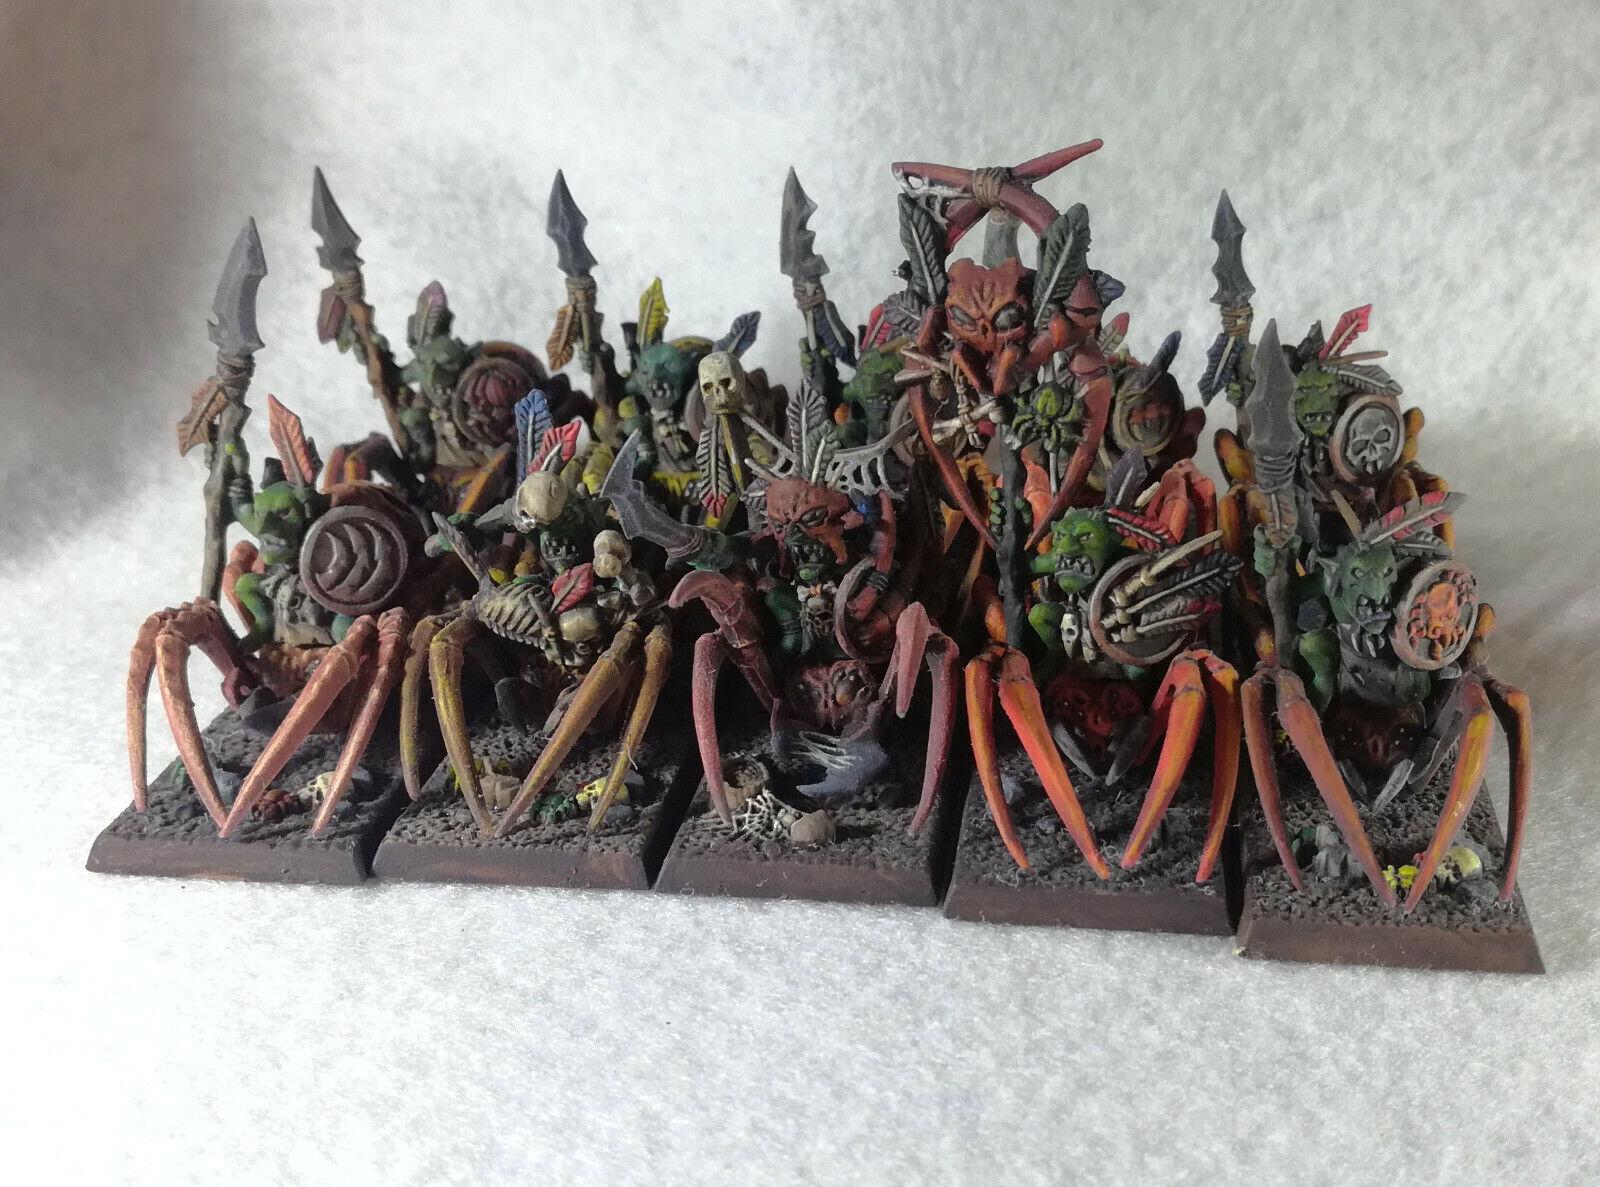 10 Forest Forest Goblin Spider Riders, PAINTED, Warhammer WFB